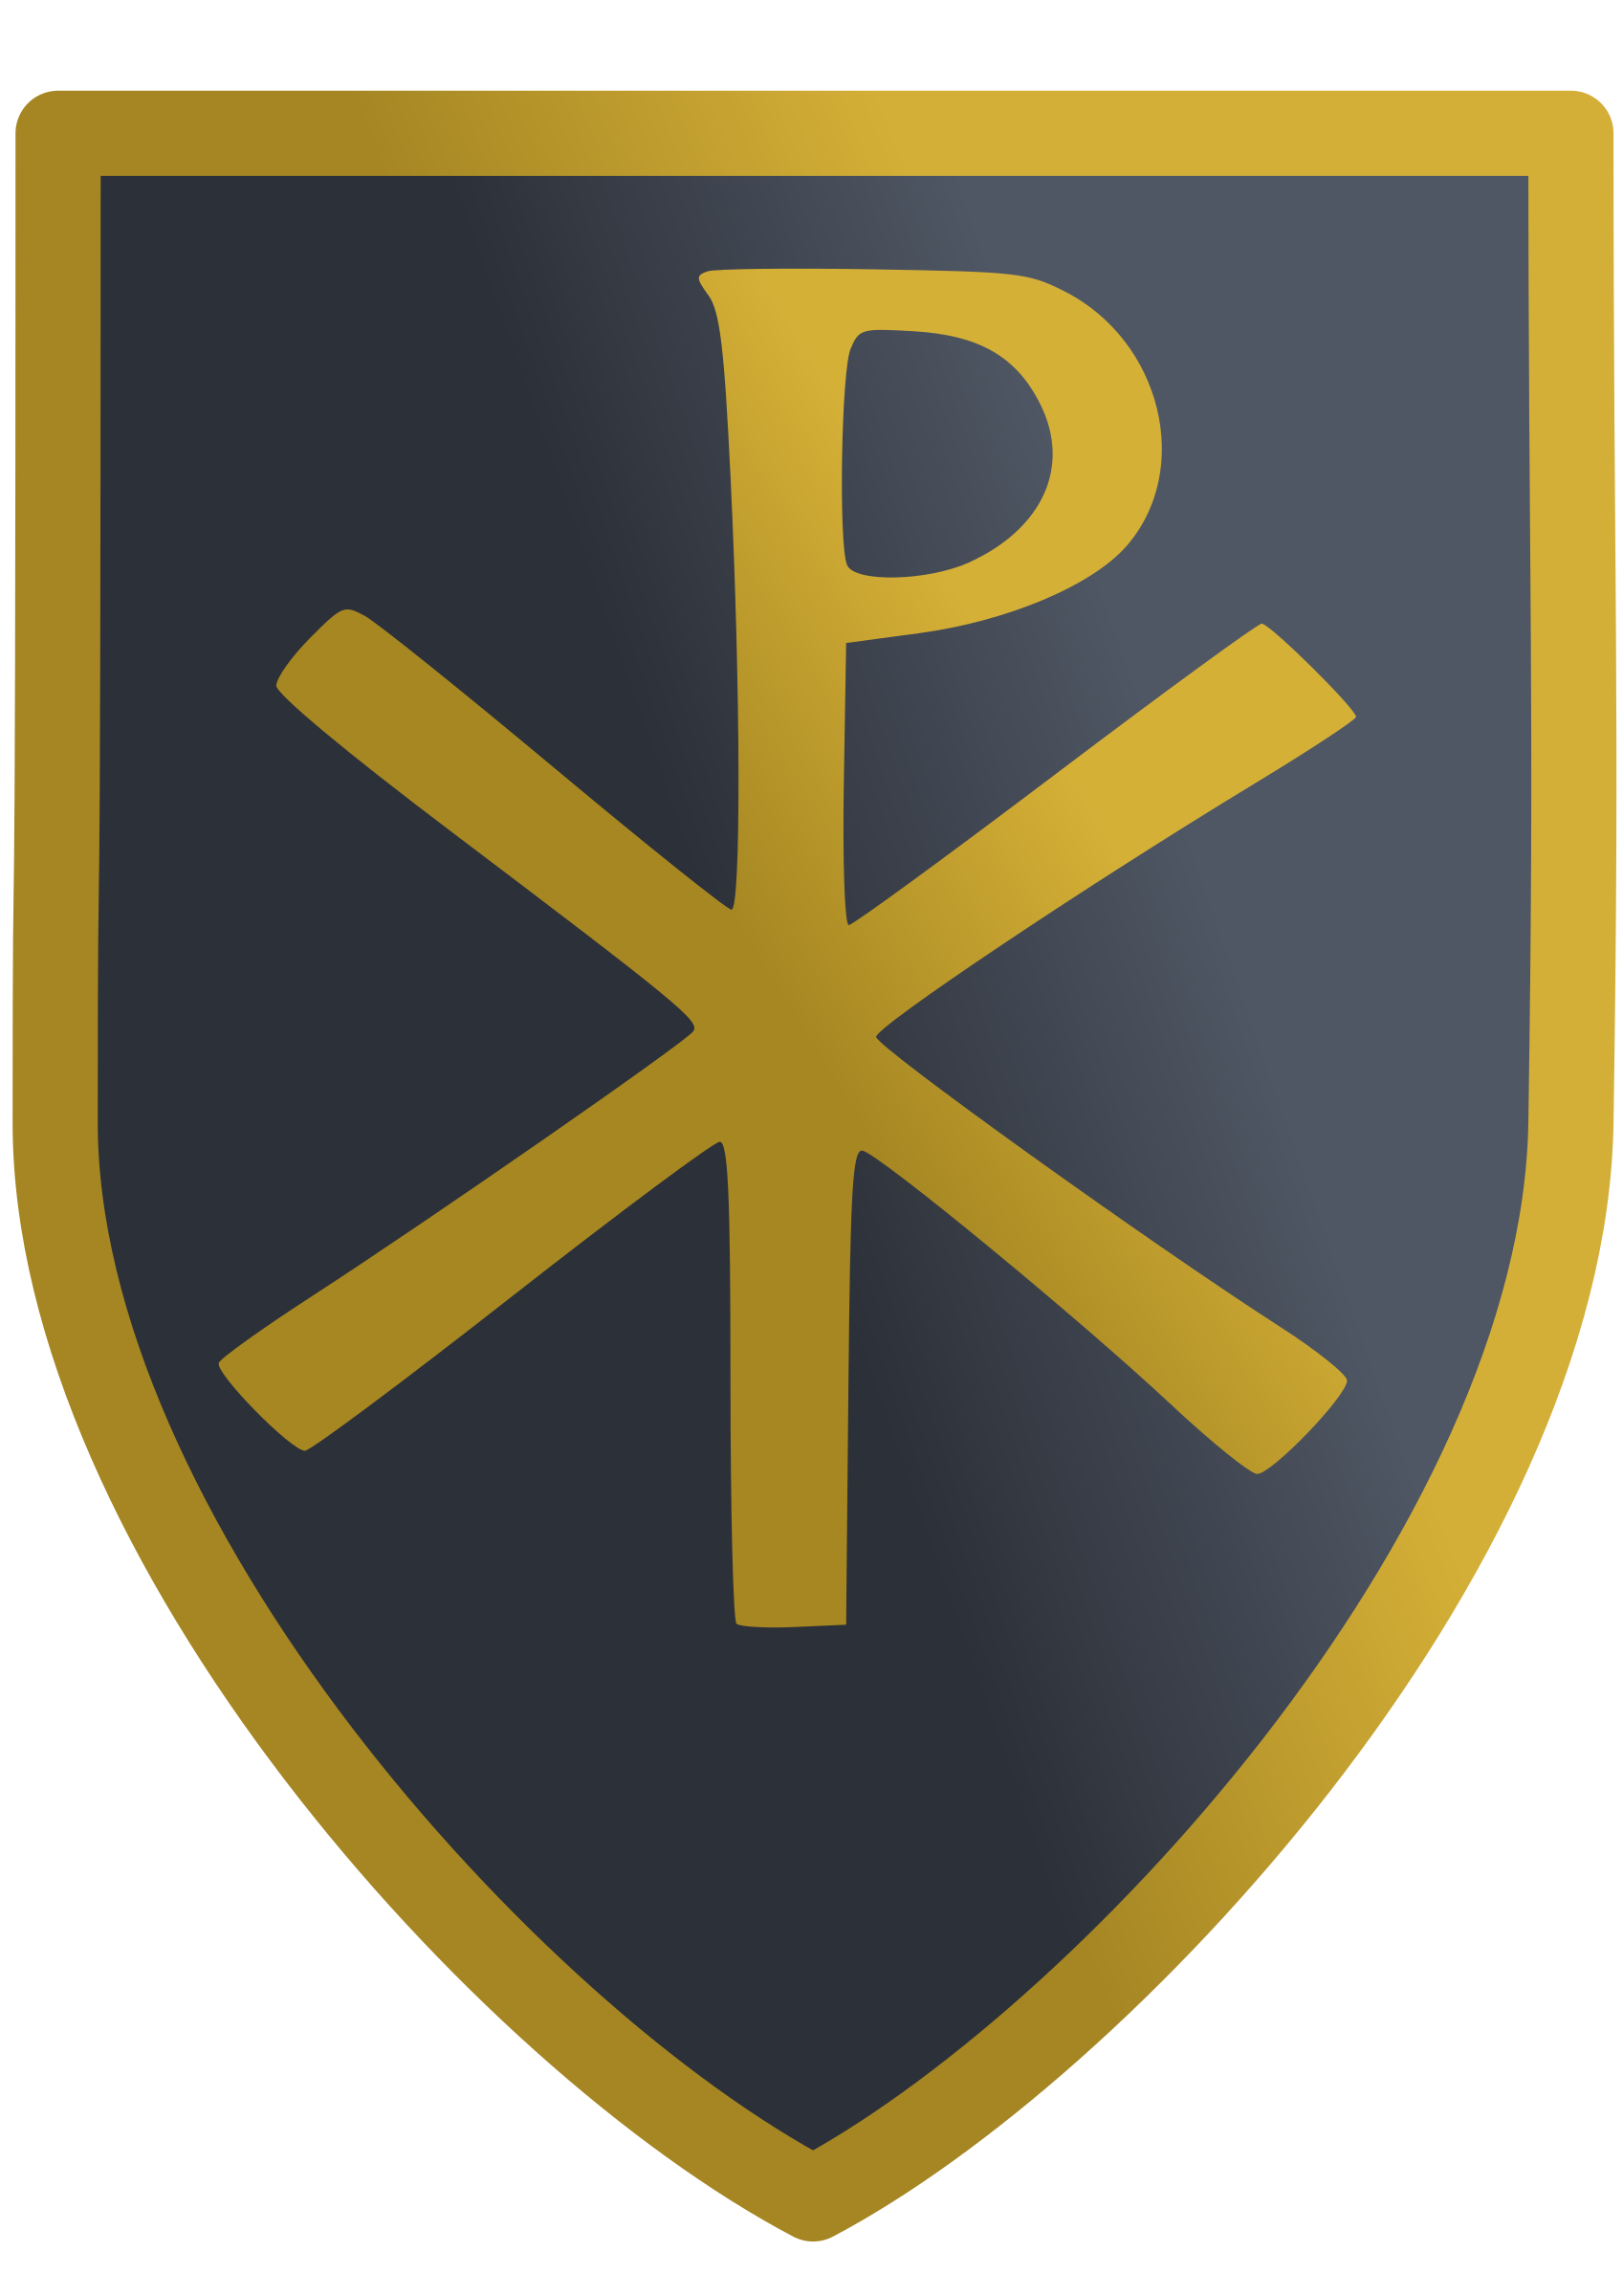 Cross shield clipart image transparent download Clipart - christian shield image transparent download